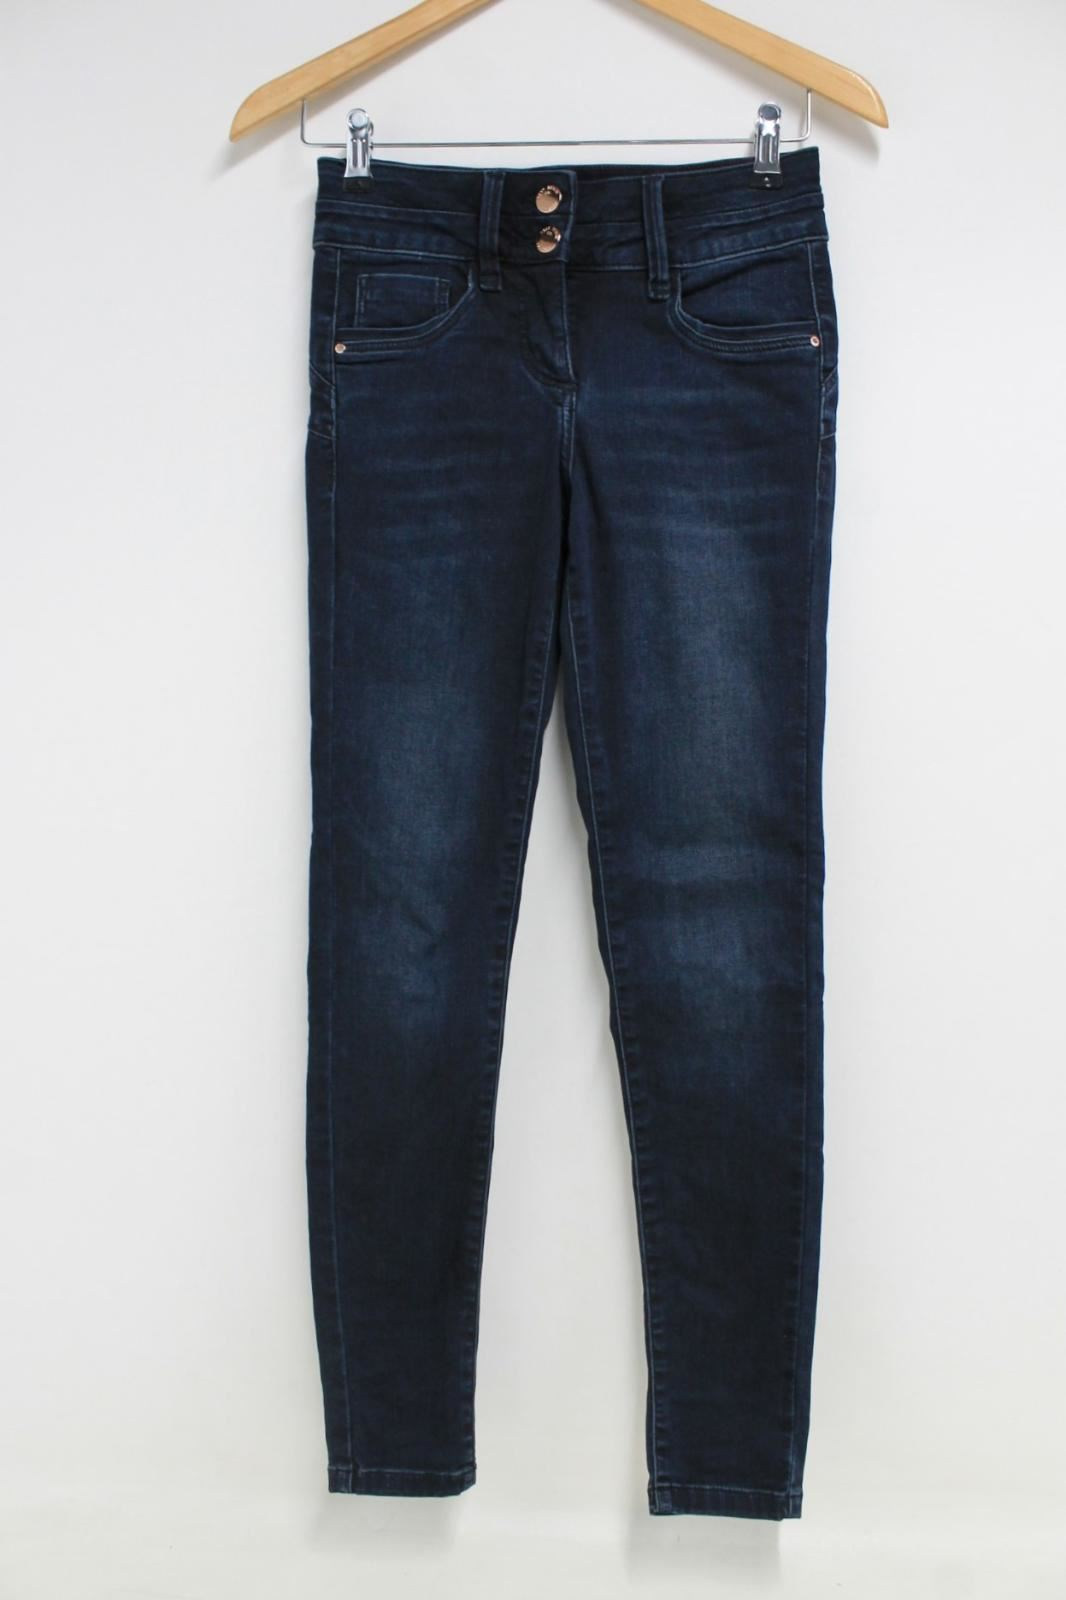 NEXT-Ladies-Navy-Blue-Stretch-Cotton-High-Rise-Straight-Leg-Skinny-Jeans-UK8